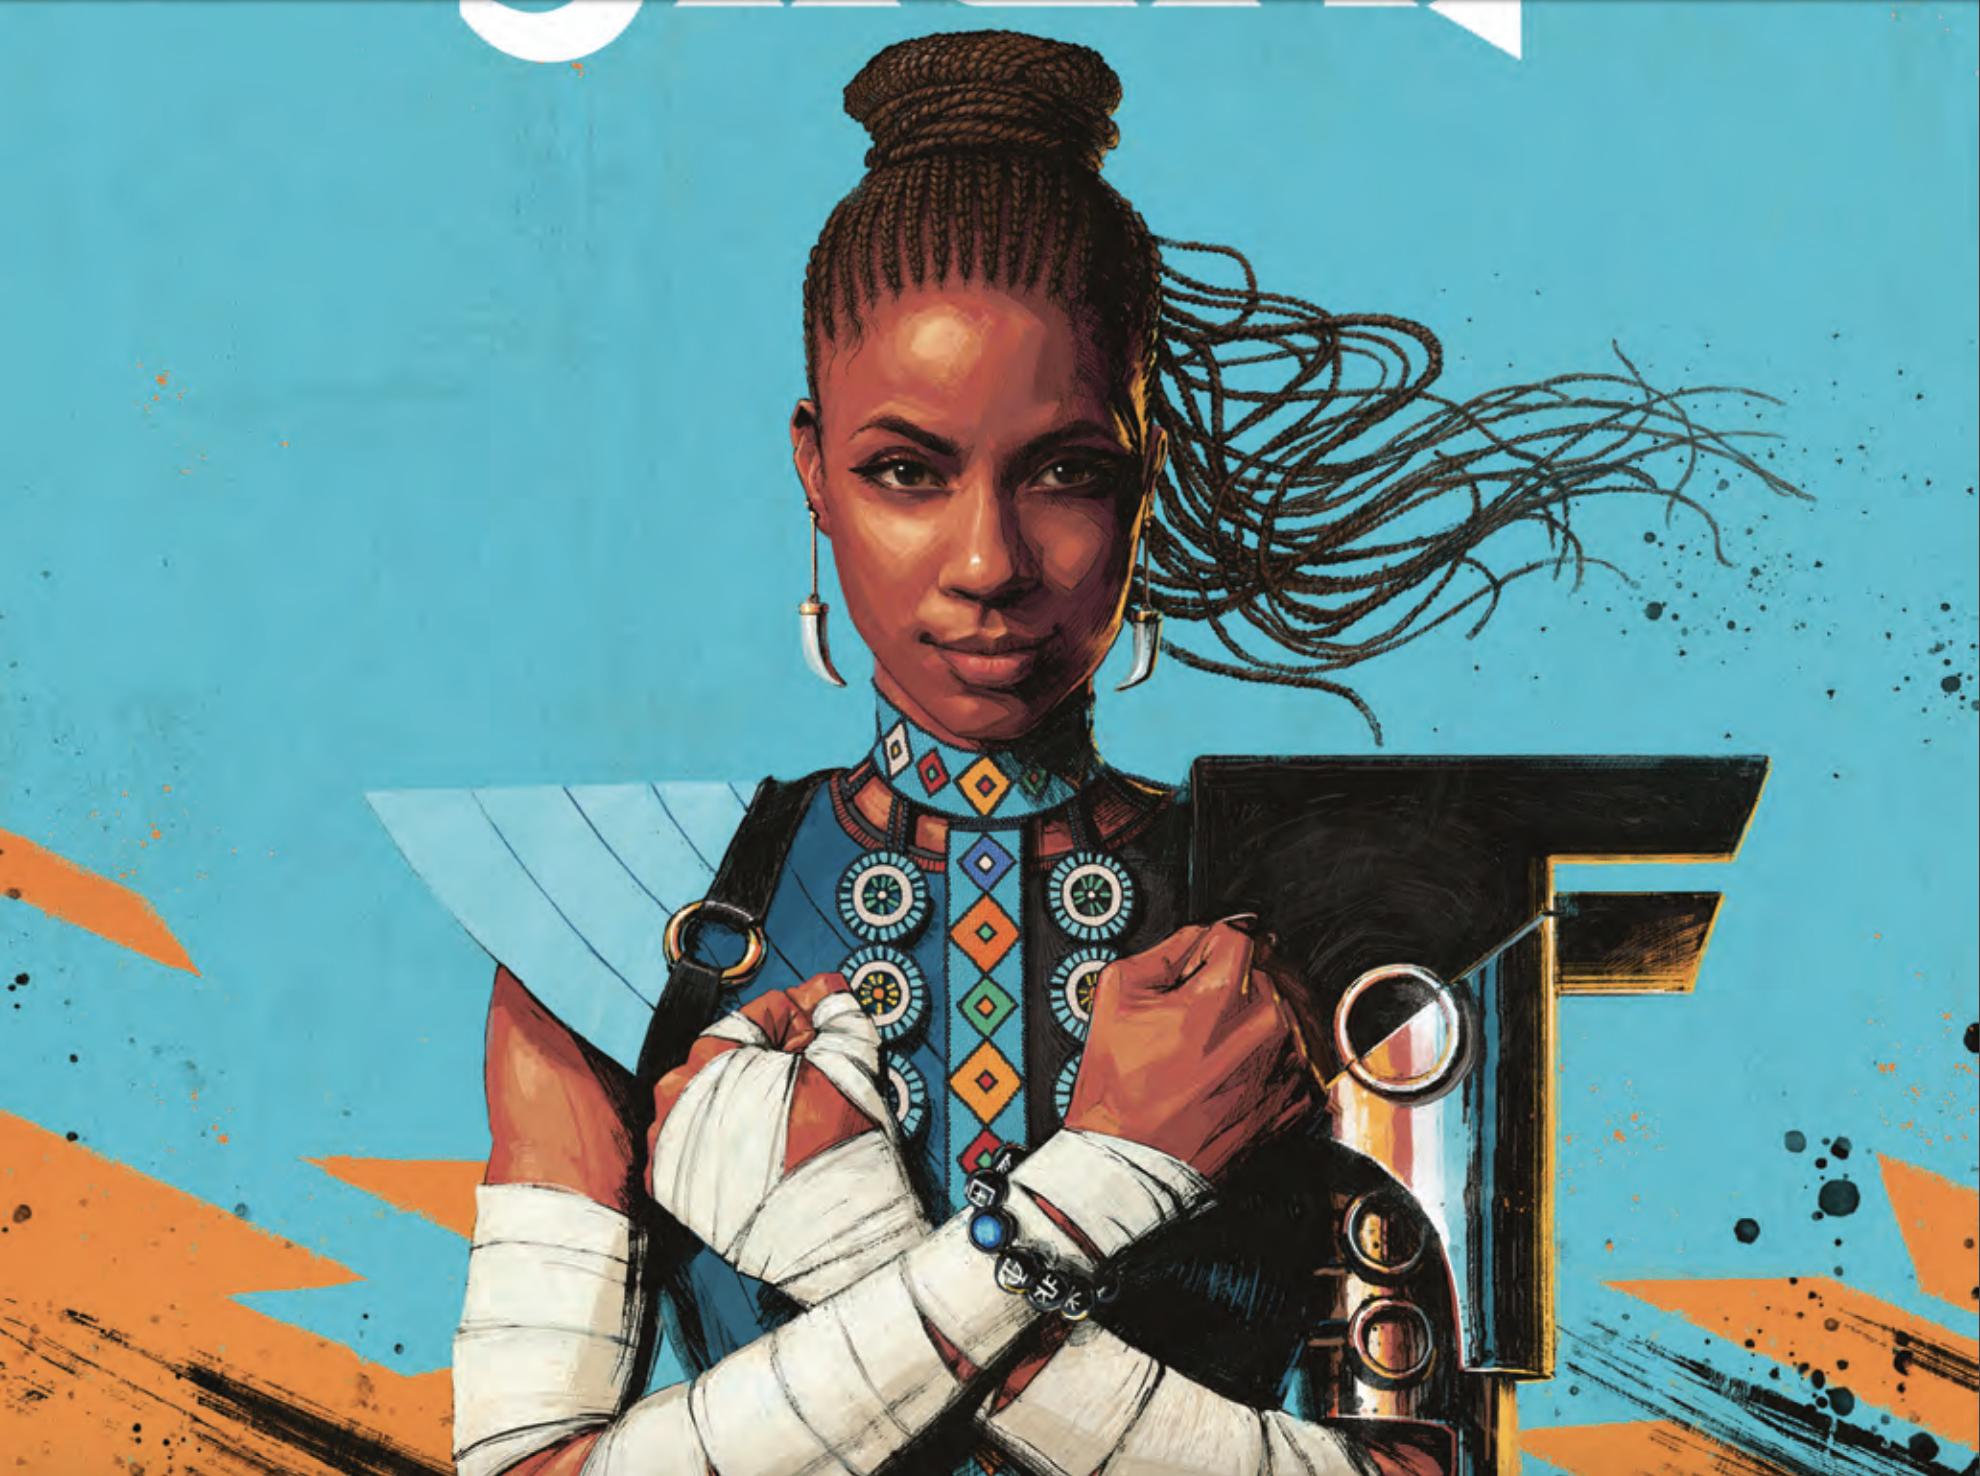 Shuri #1 gives Wakanda's princess her own Black Panther moment